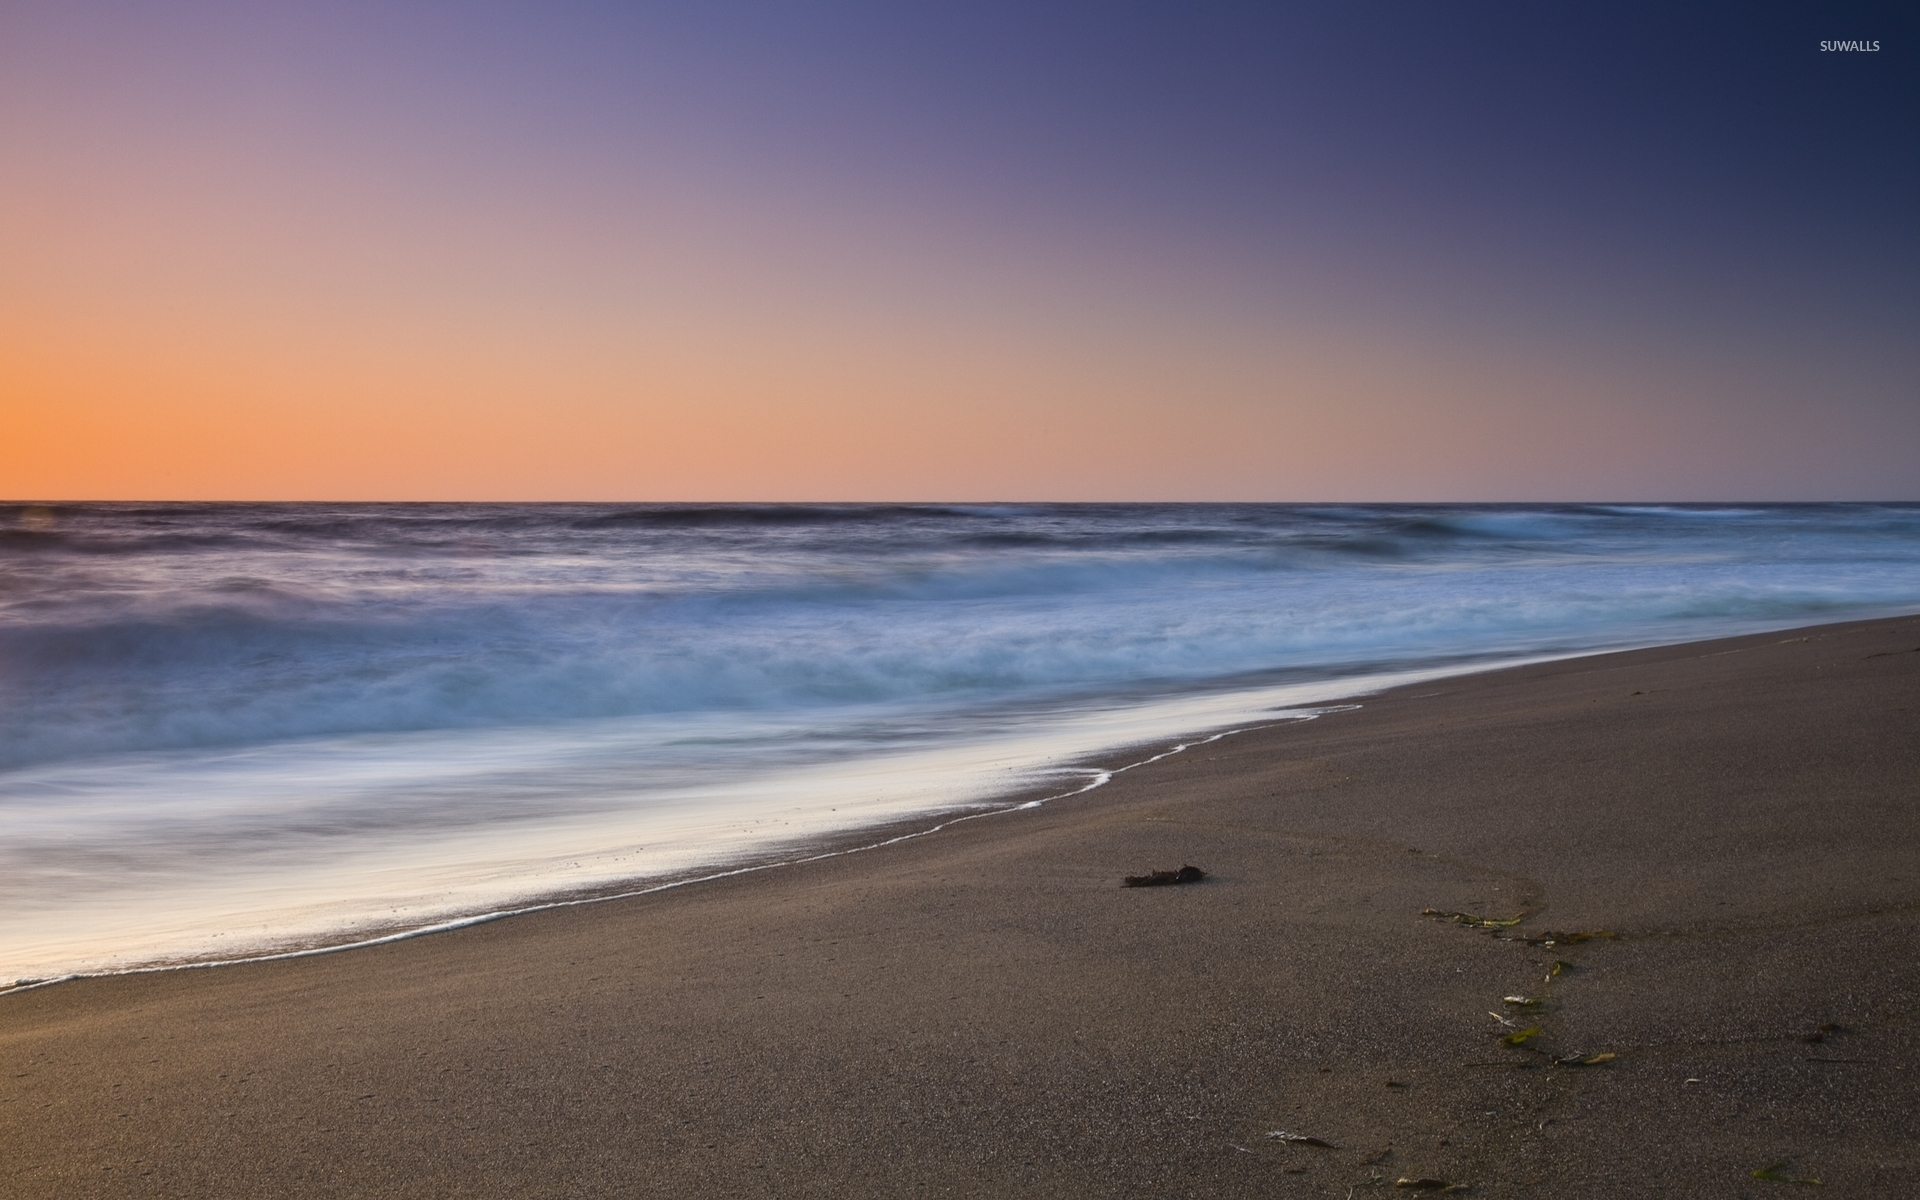 Sandy Beach Wallpaper: Foamy Waves Approaching The Sandy Beach Wallpaper